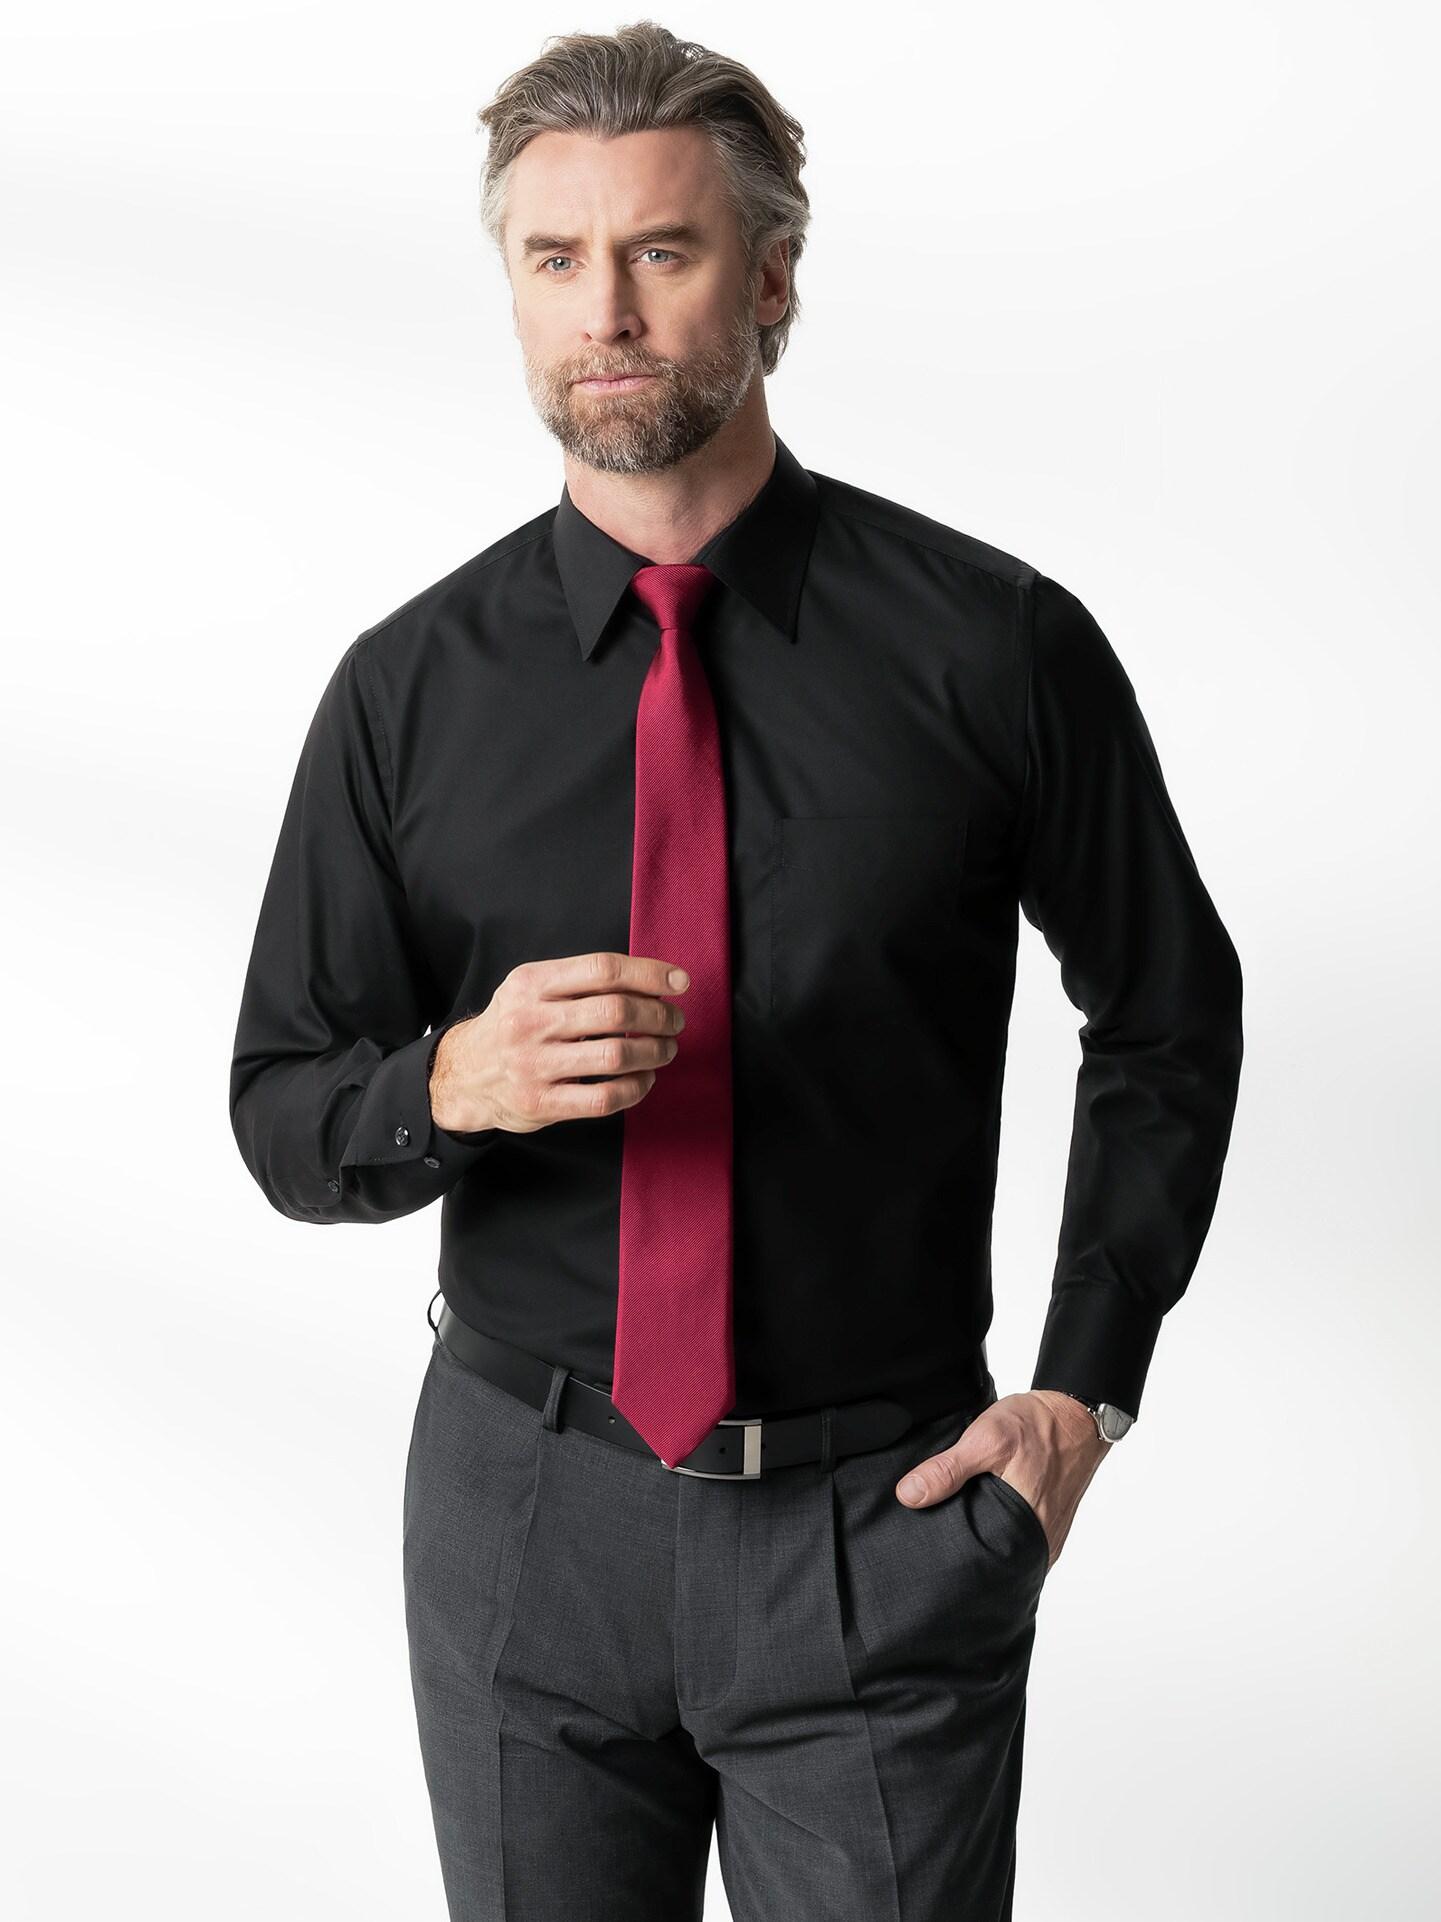 extraglatt hemd permablack direkt hier kaufen walbusch. Black Bedroom Furniture Sets. Home Design Ideas